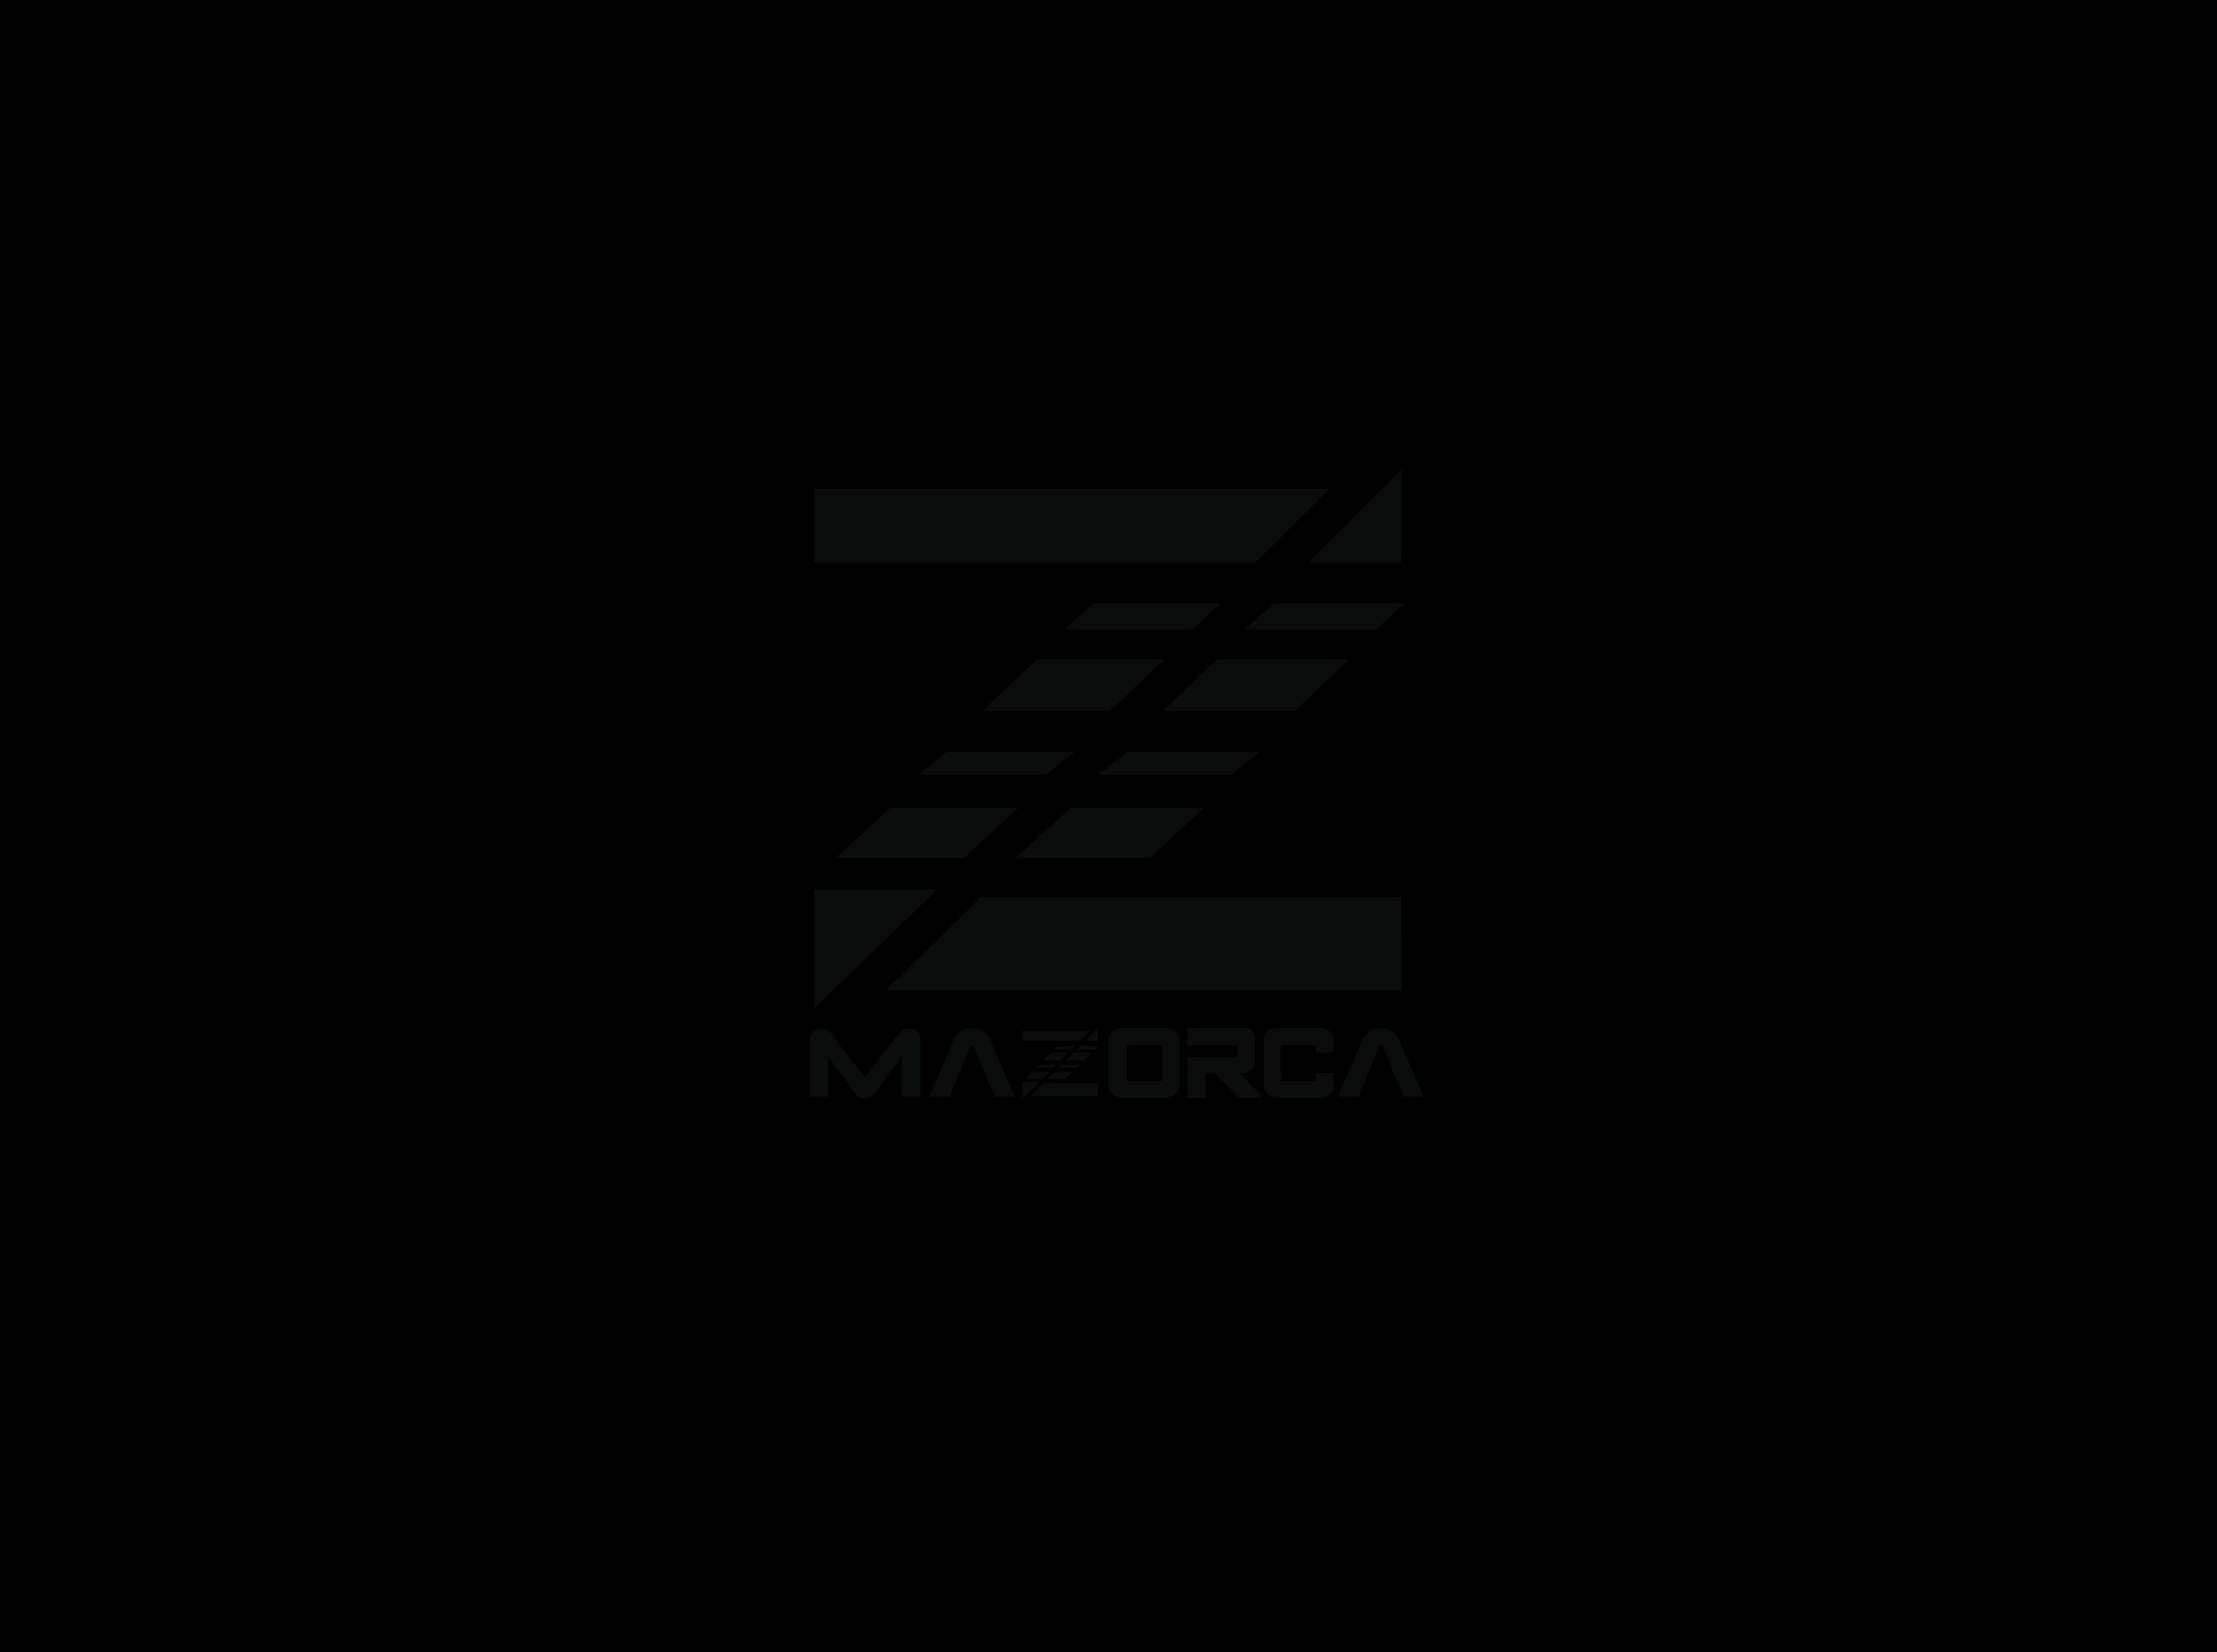 Mazorca surf logo